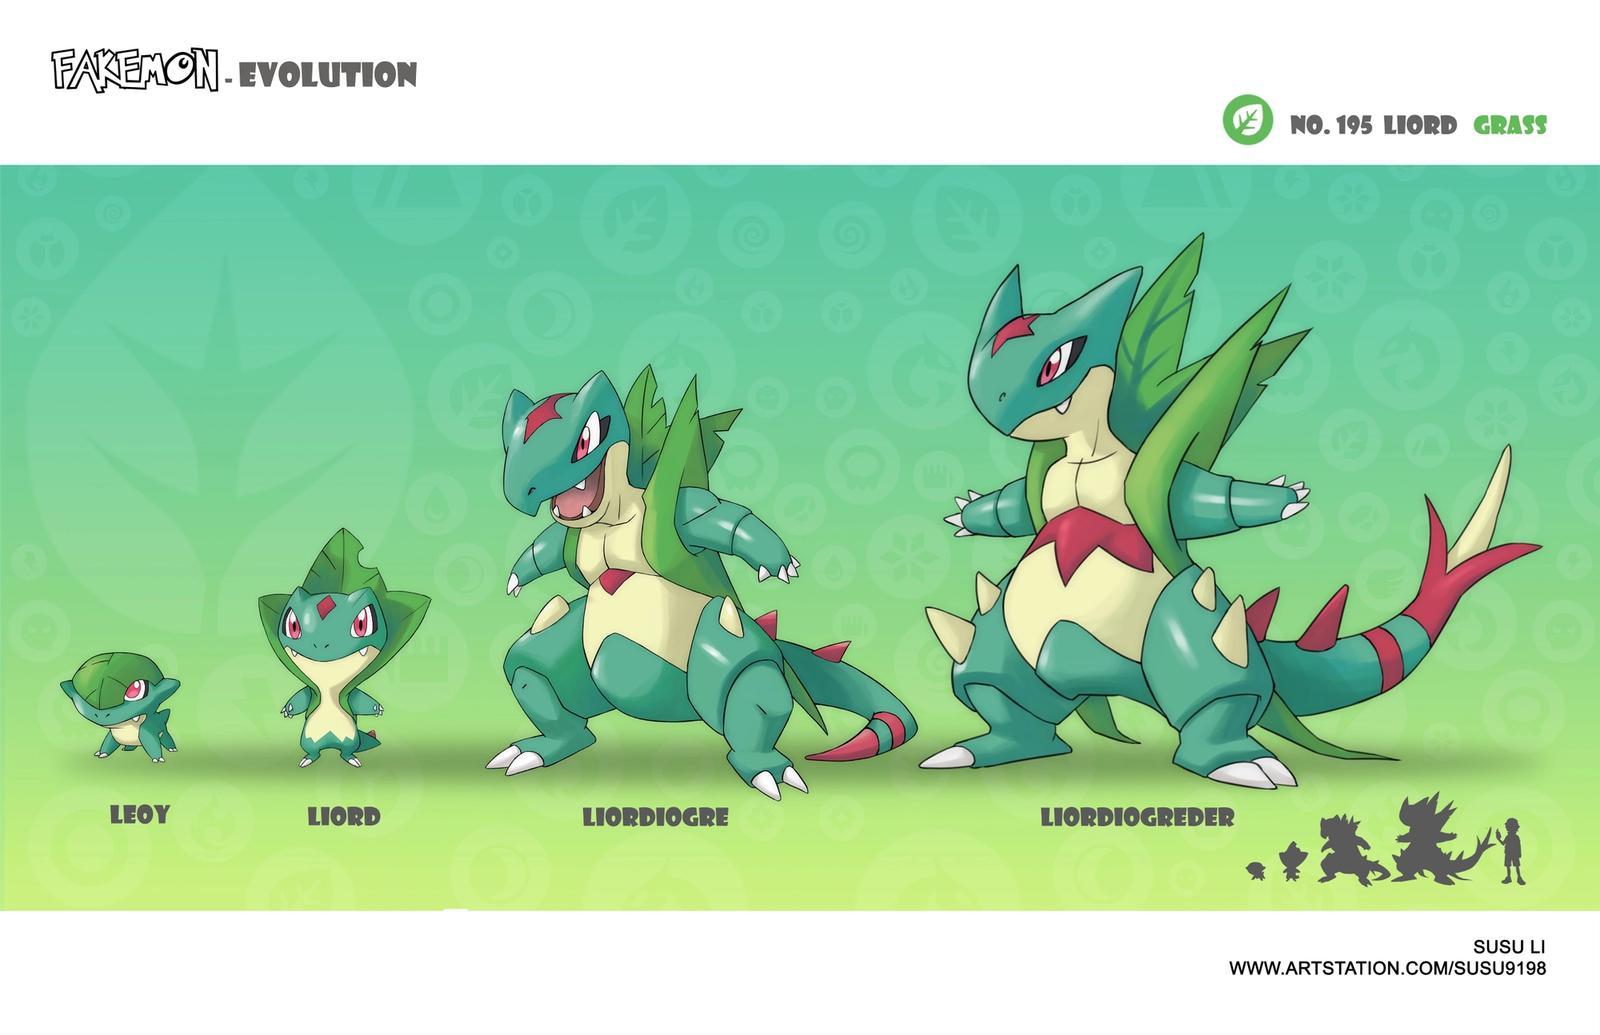 Liord - Fakemon Evolution